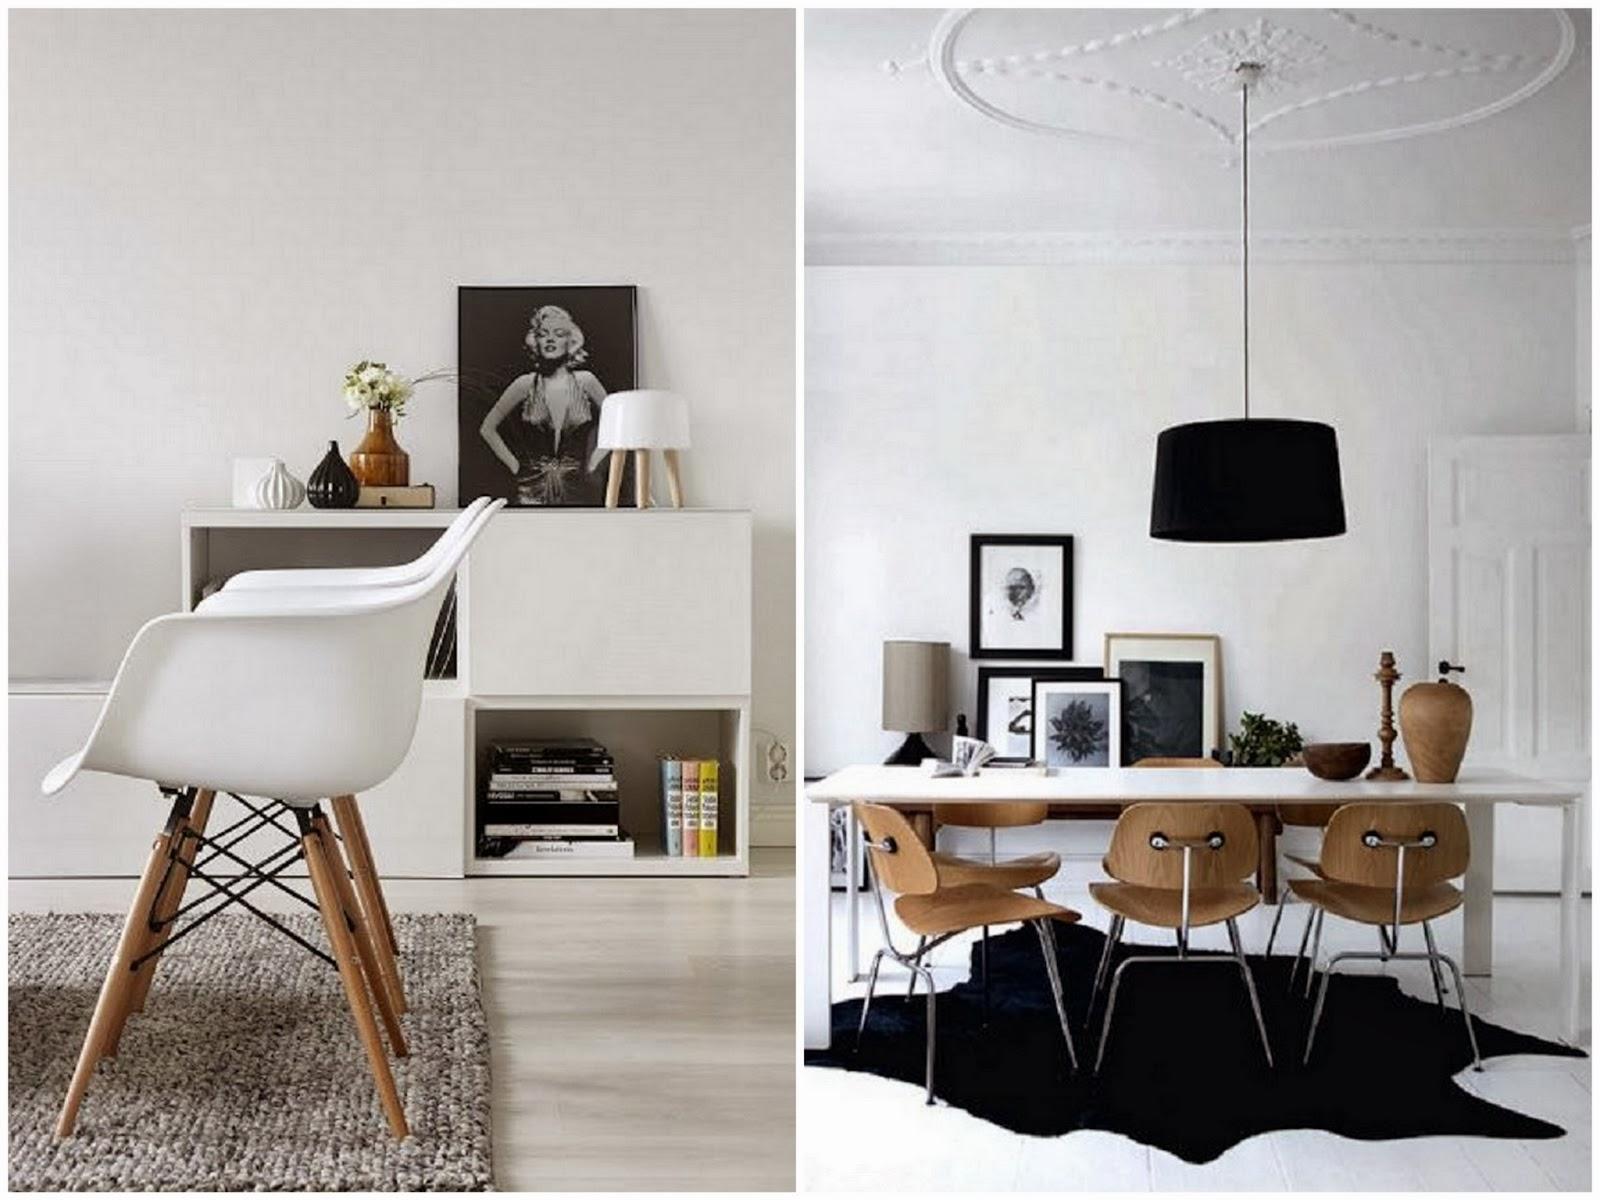 M s mesa en madera metal dise o charles y ray eames tablero en diferentes maderas - Muebles eames ...